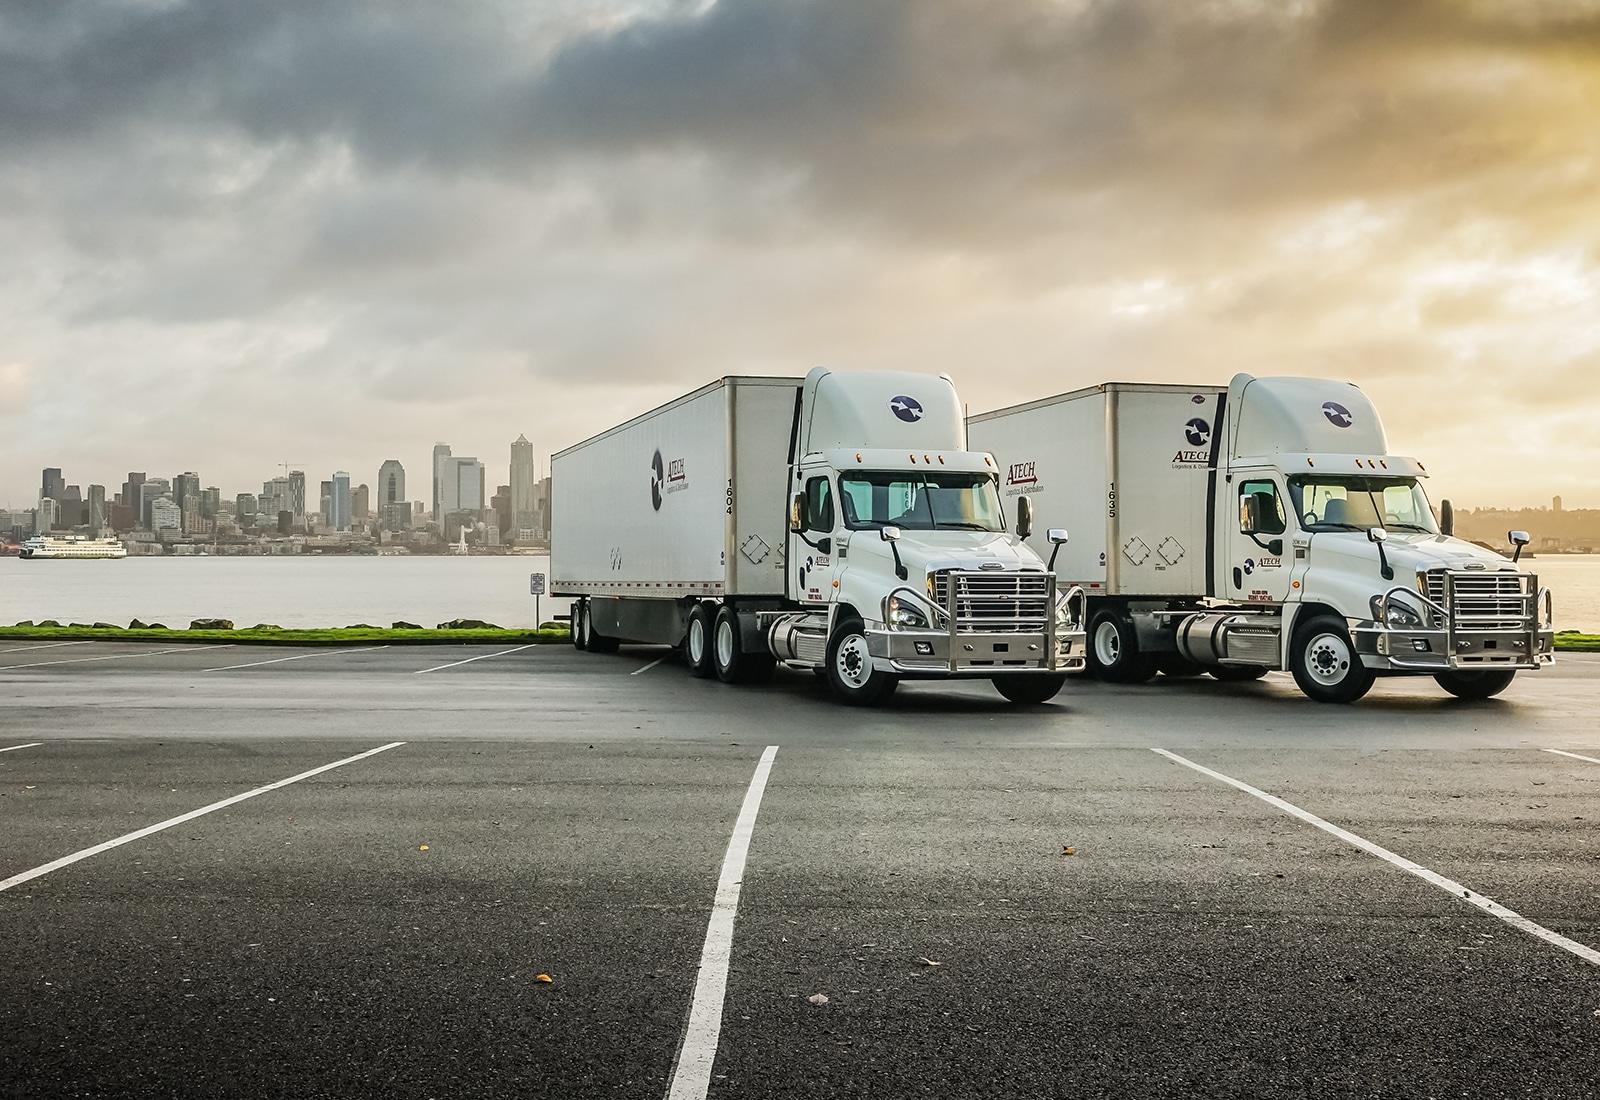 Atech Logistics & Distribution